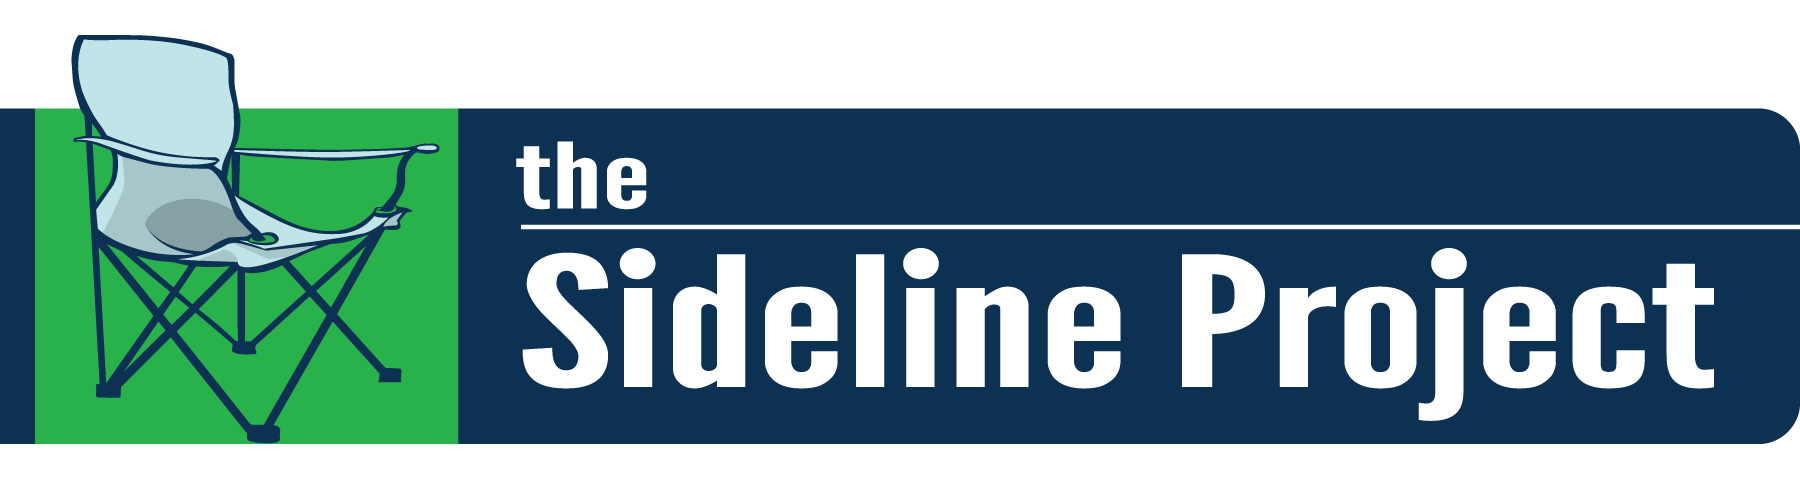 SidelineProjectLogolargecopy